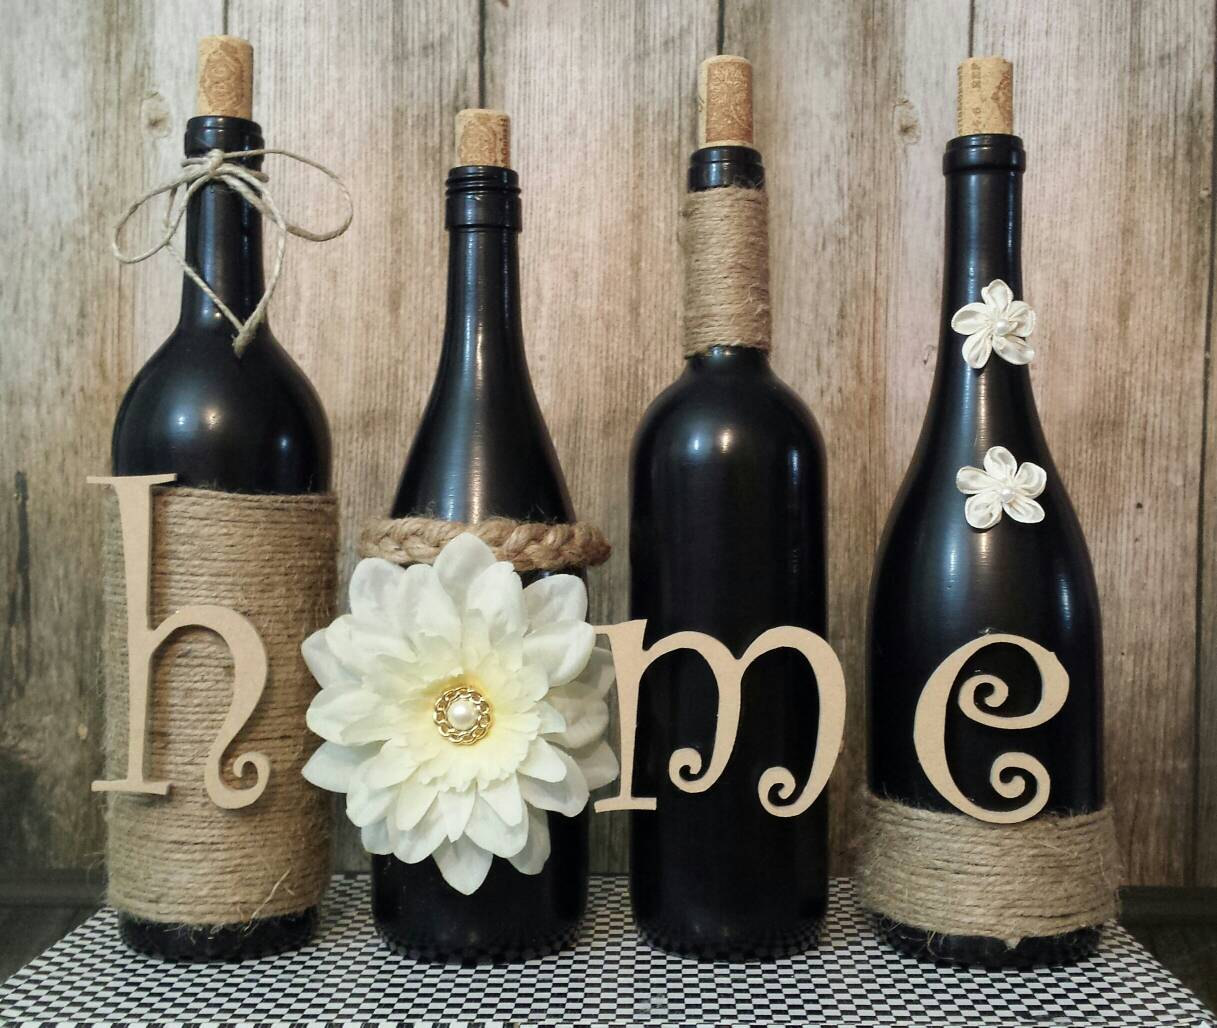 Flowers & Twine 'home' Wine Bottles